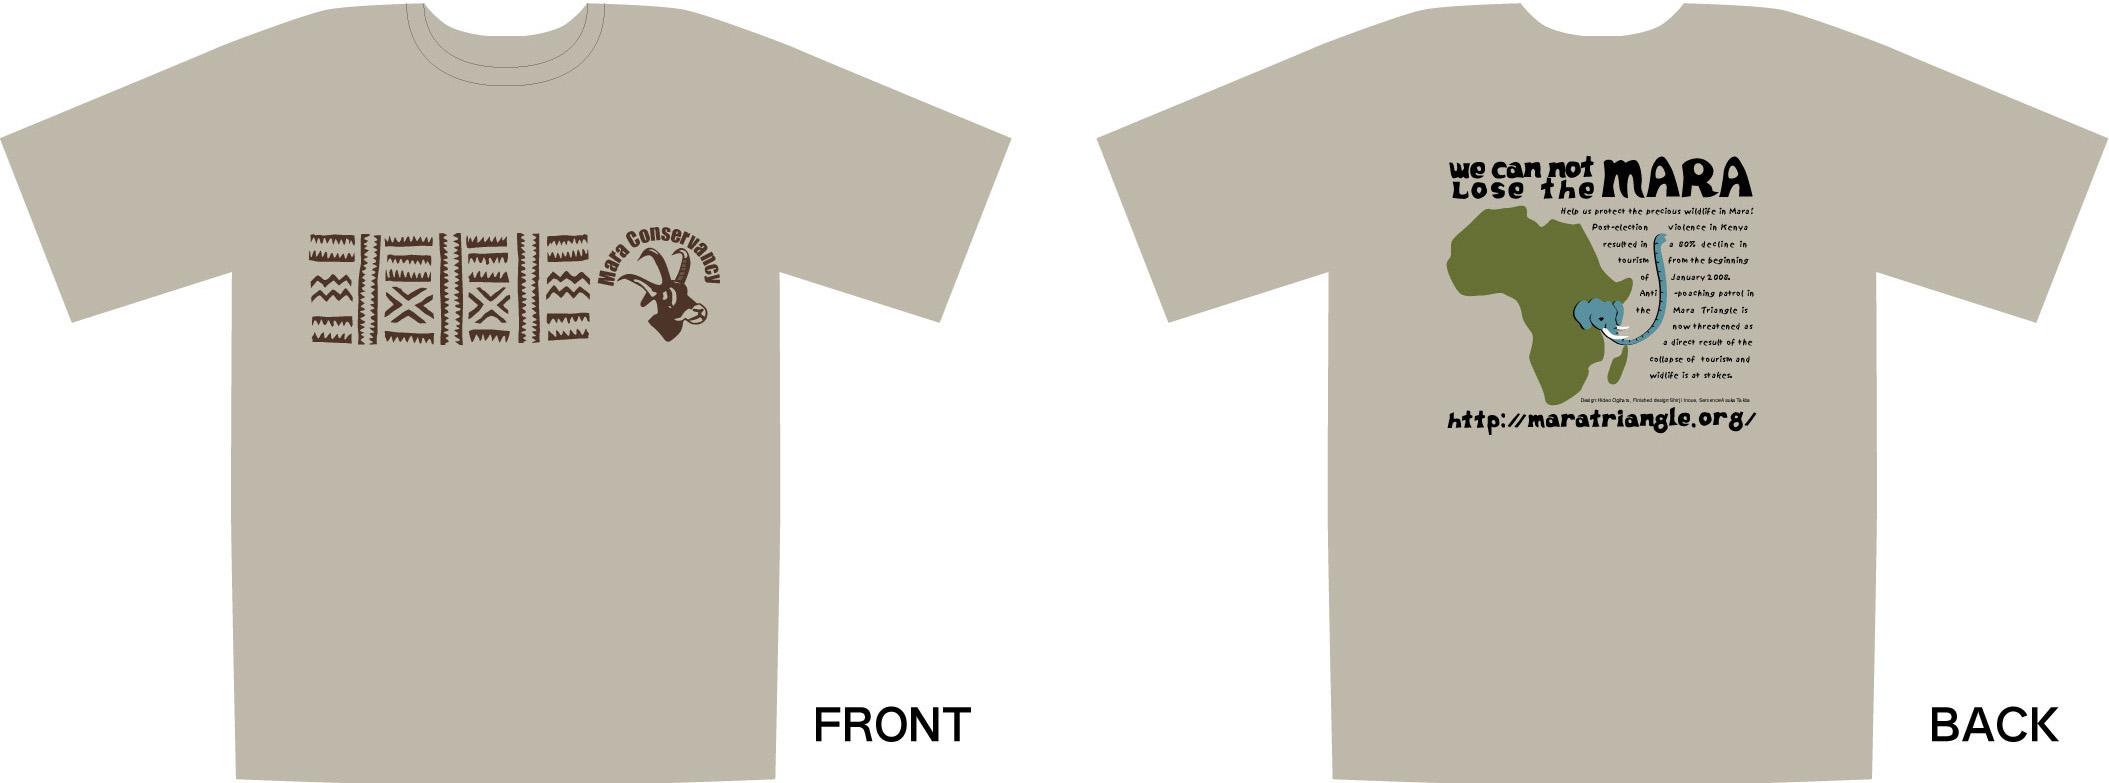 "\""WE CANNOT LOSE THE MARA"" Tシャツ\""販売_b0137038_20401778.jpg"